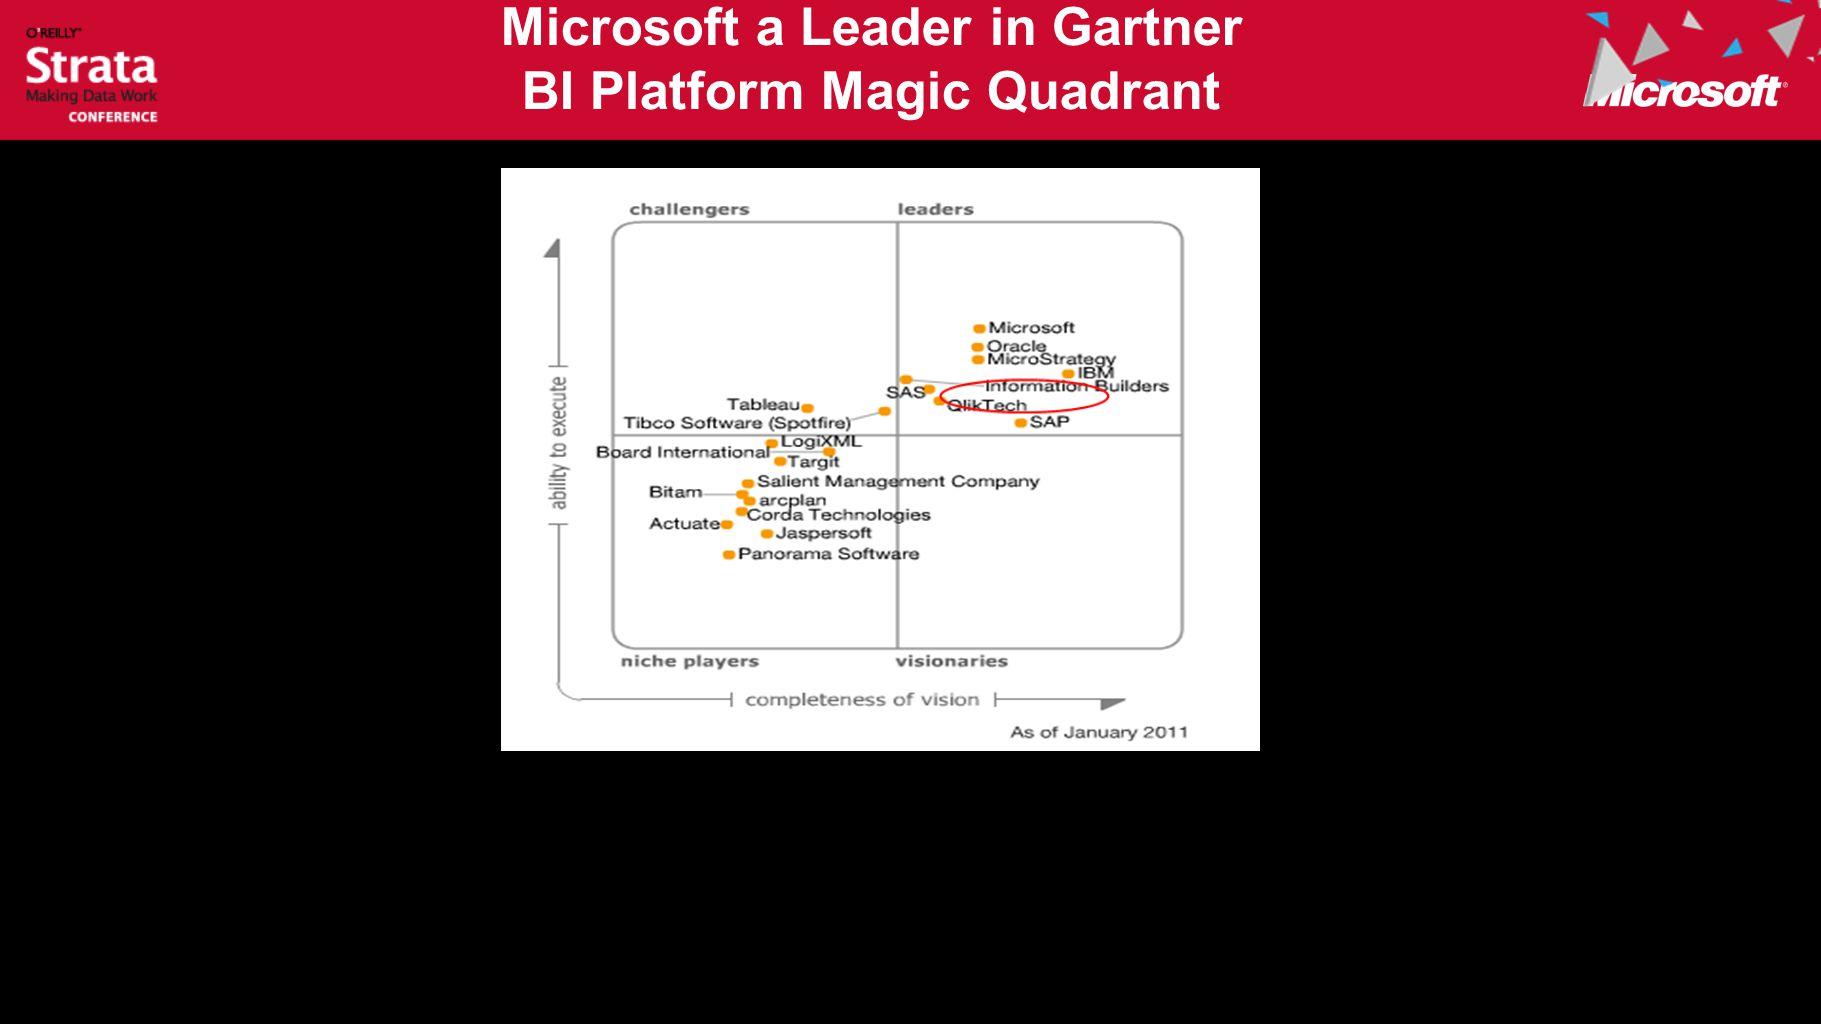 Microsoft a Leader in Gartner BI Platform Magic Quadrant